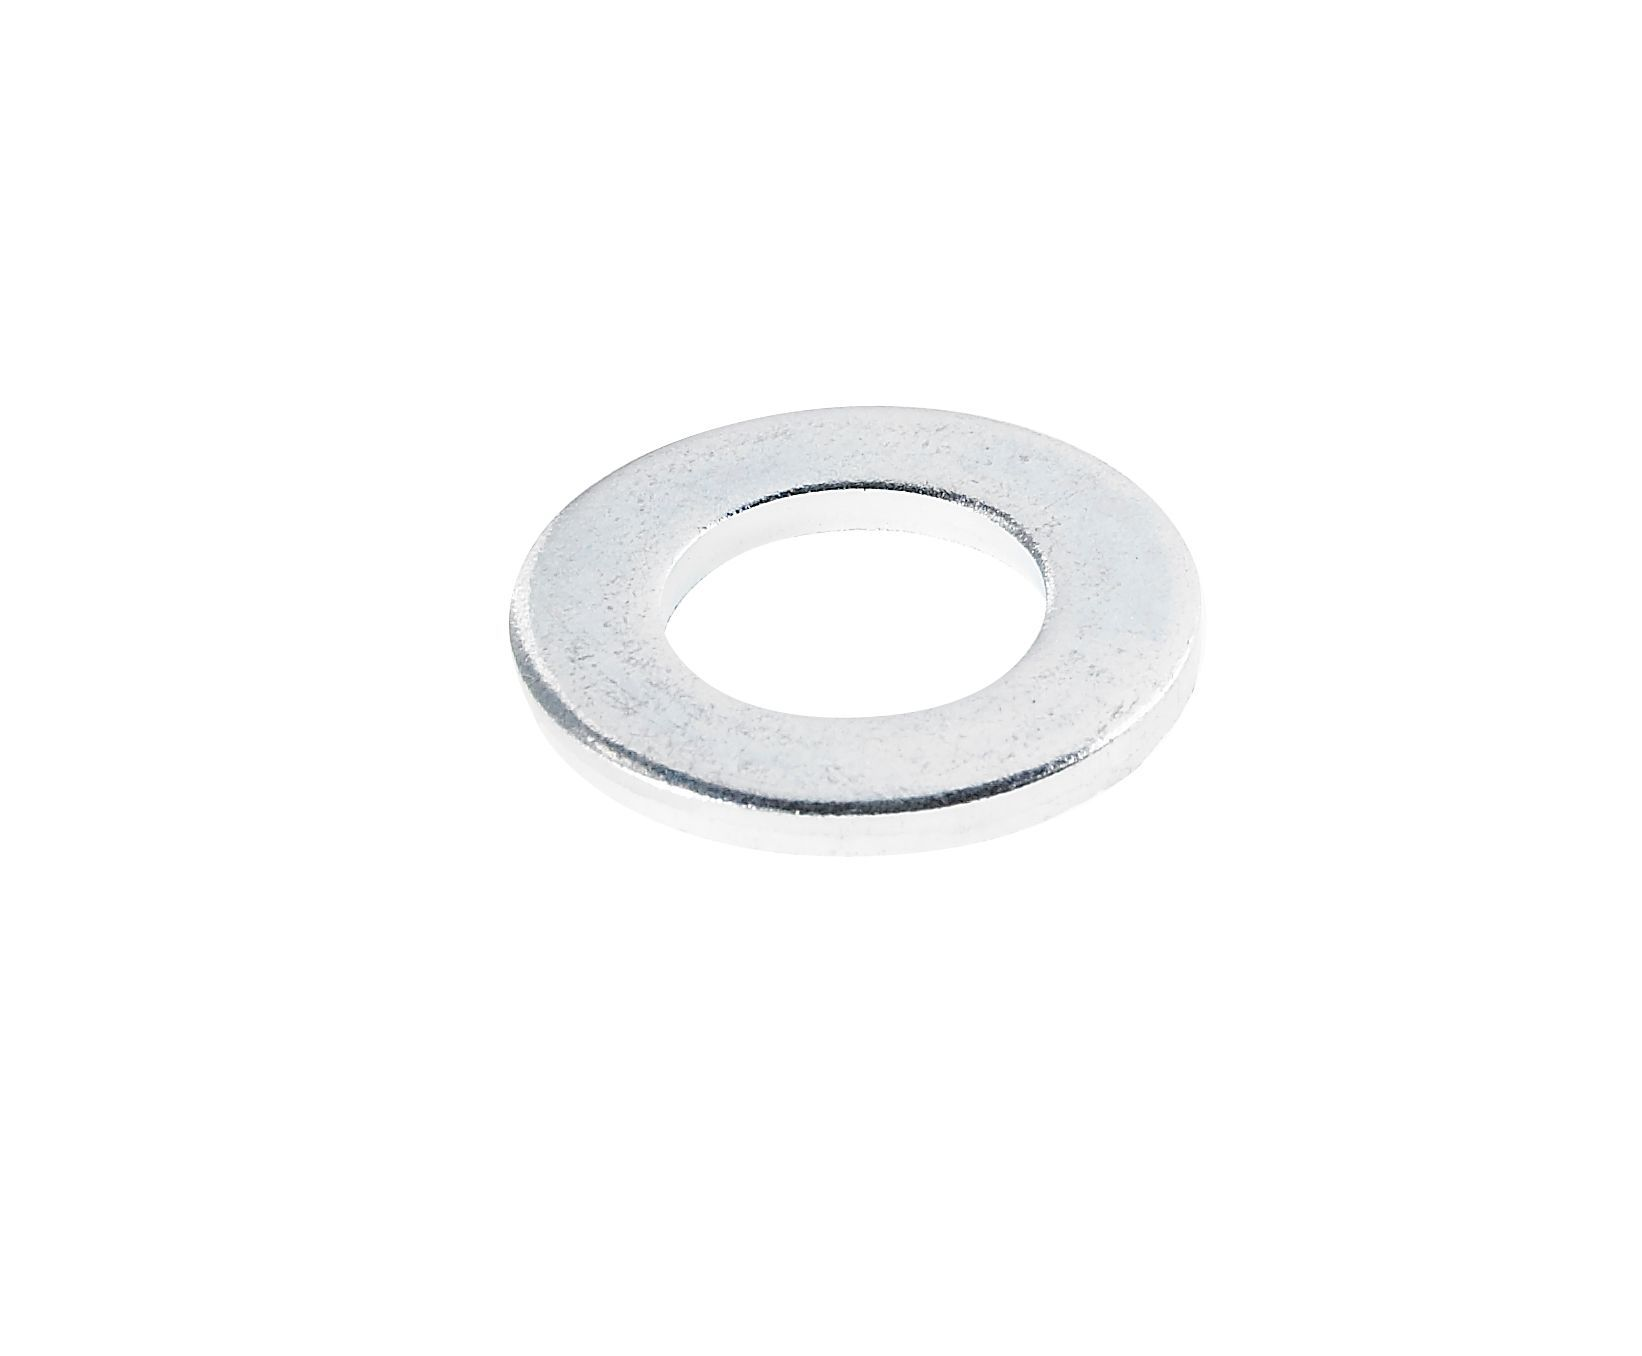 Avf M12 Steel Flat Washer, Pack Of 10